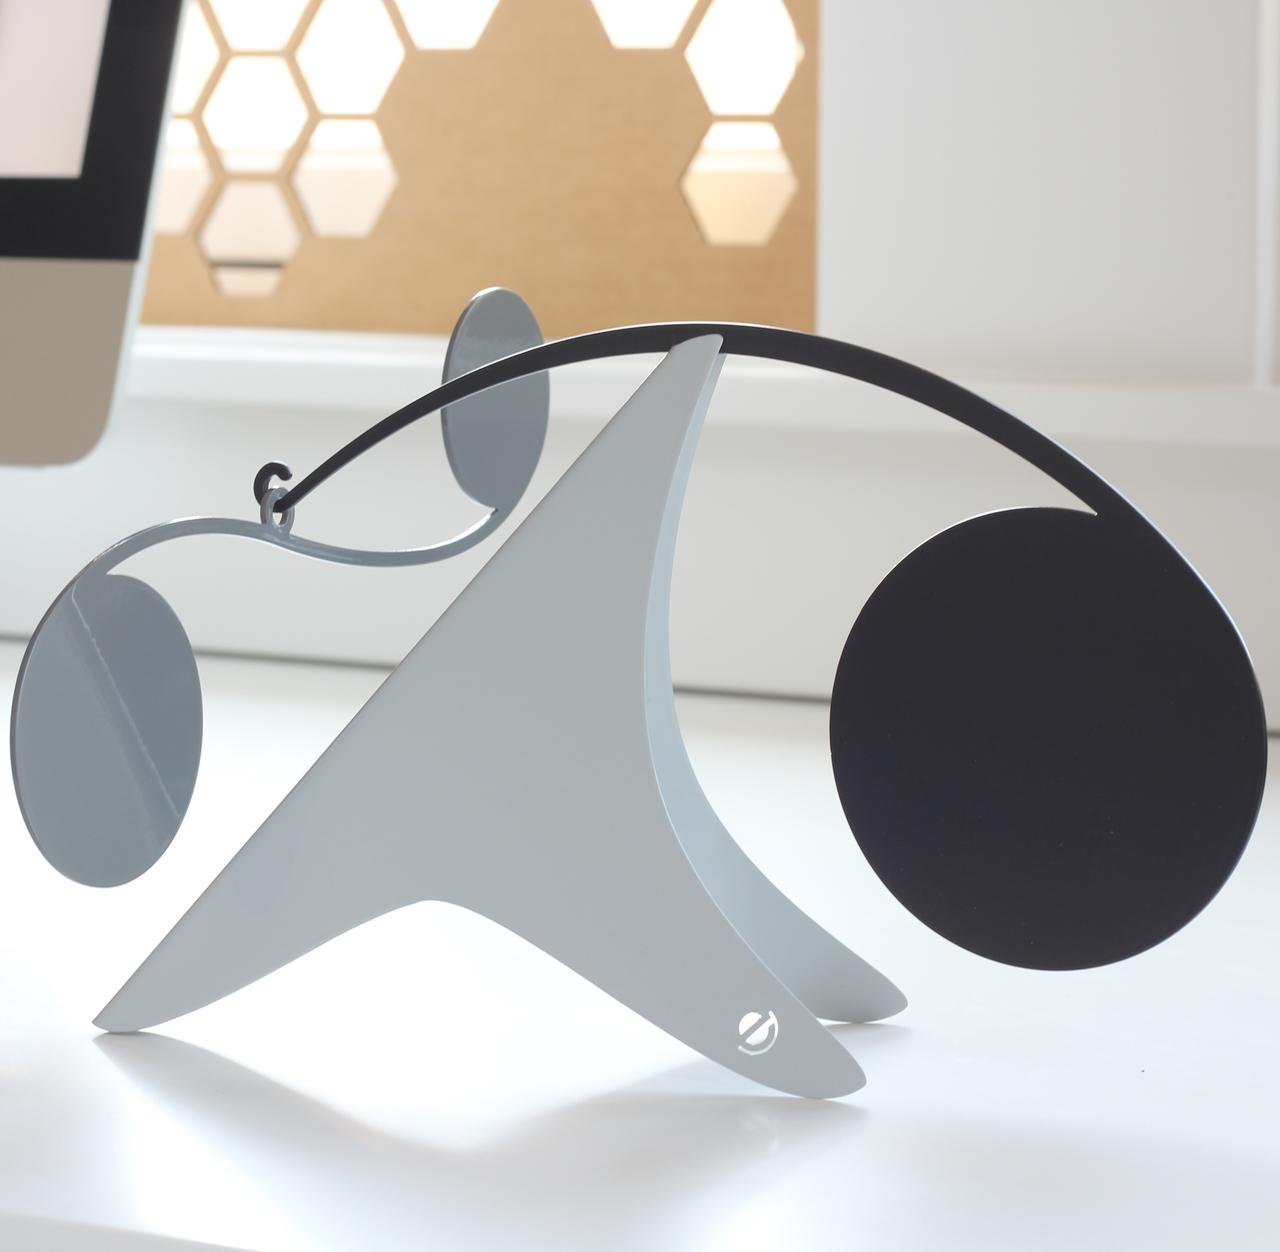 Ekko Workshop Mosaic Desktop Mobile